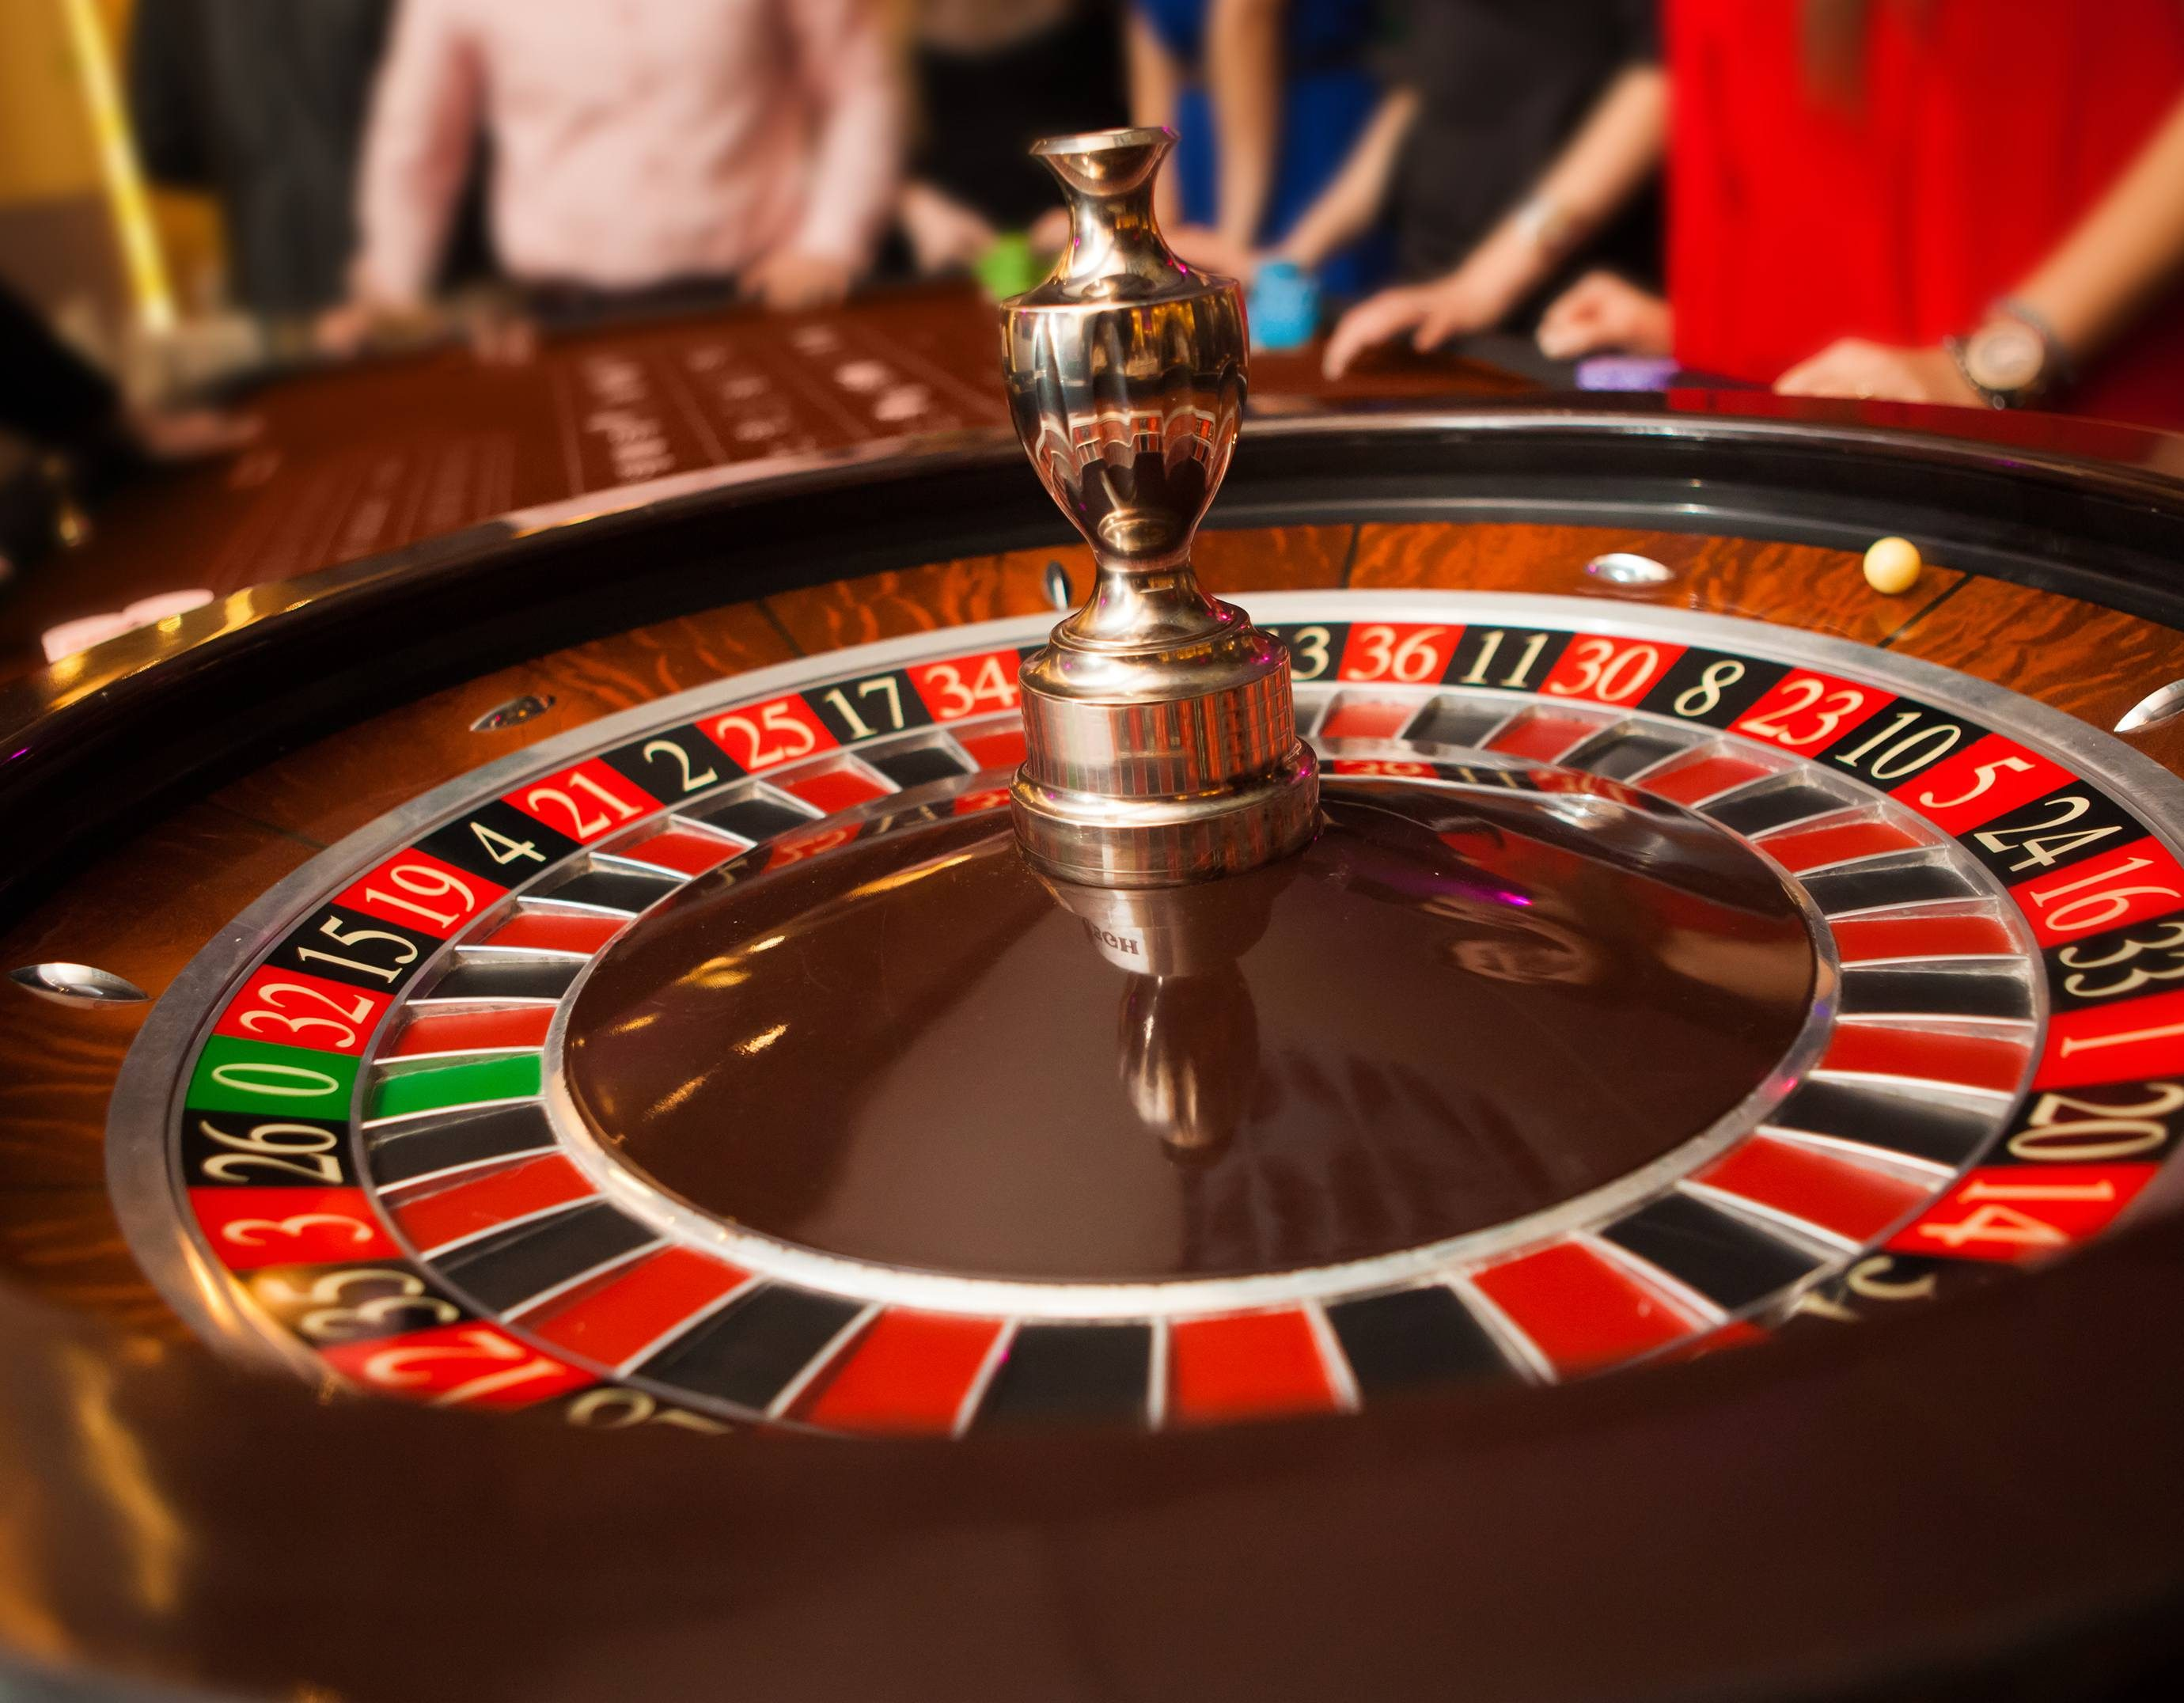 Card fraudster blames gambling addiction